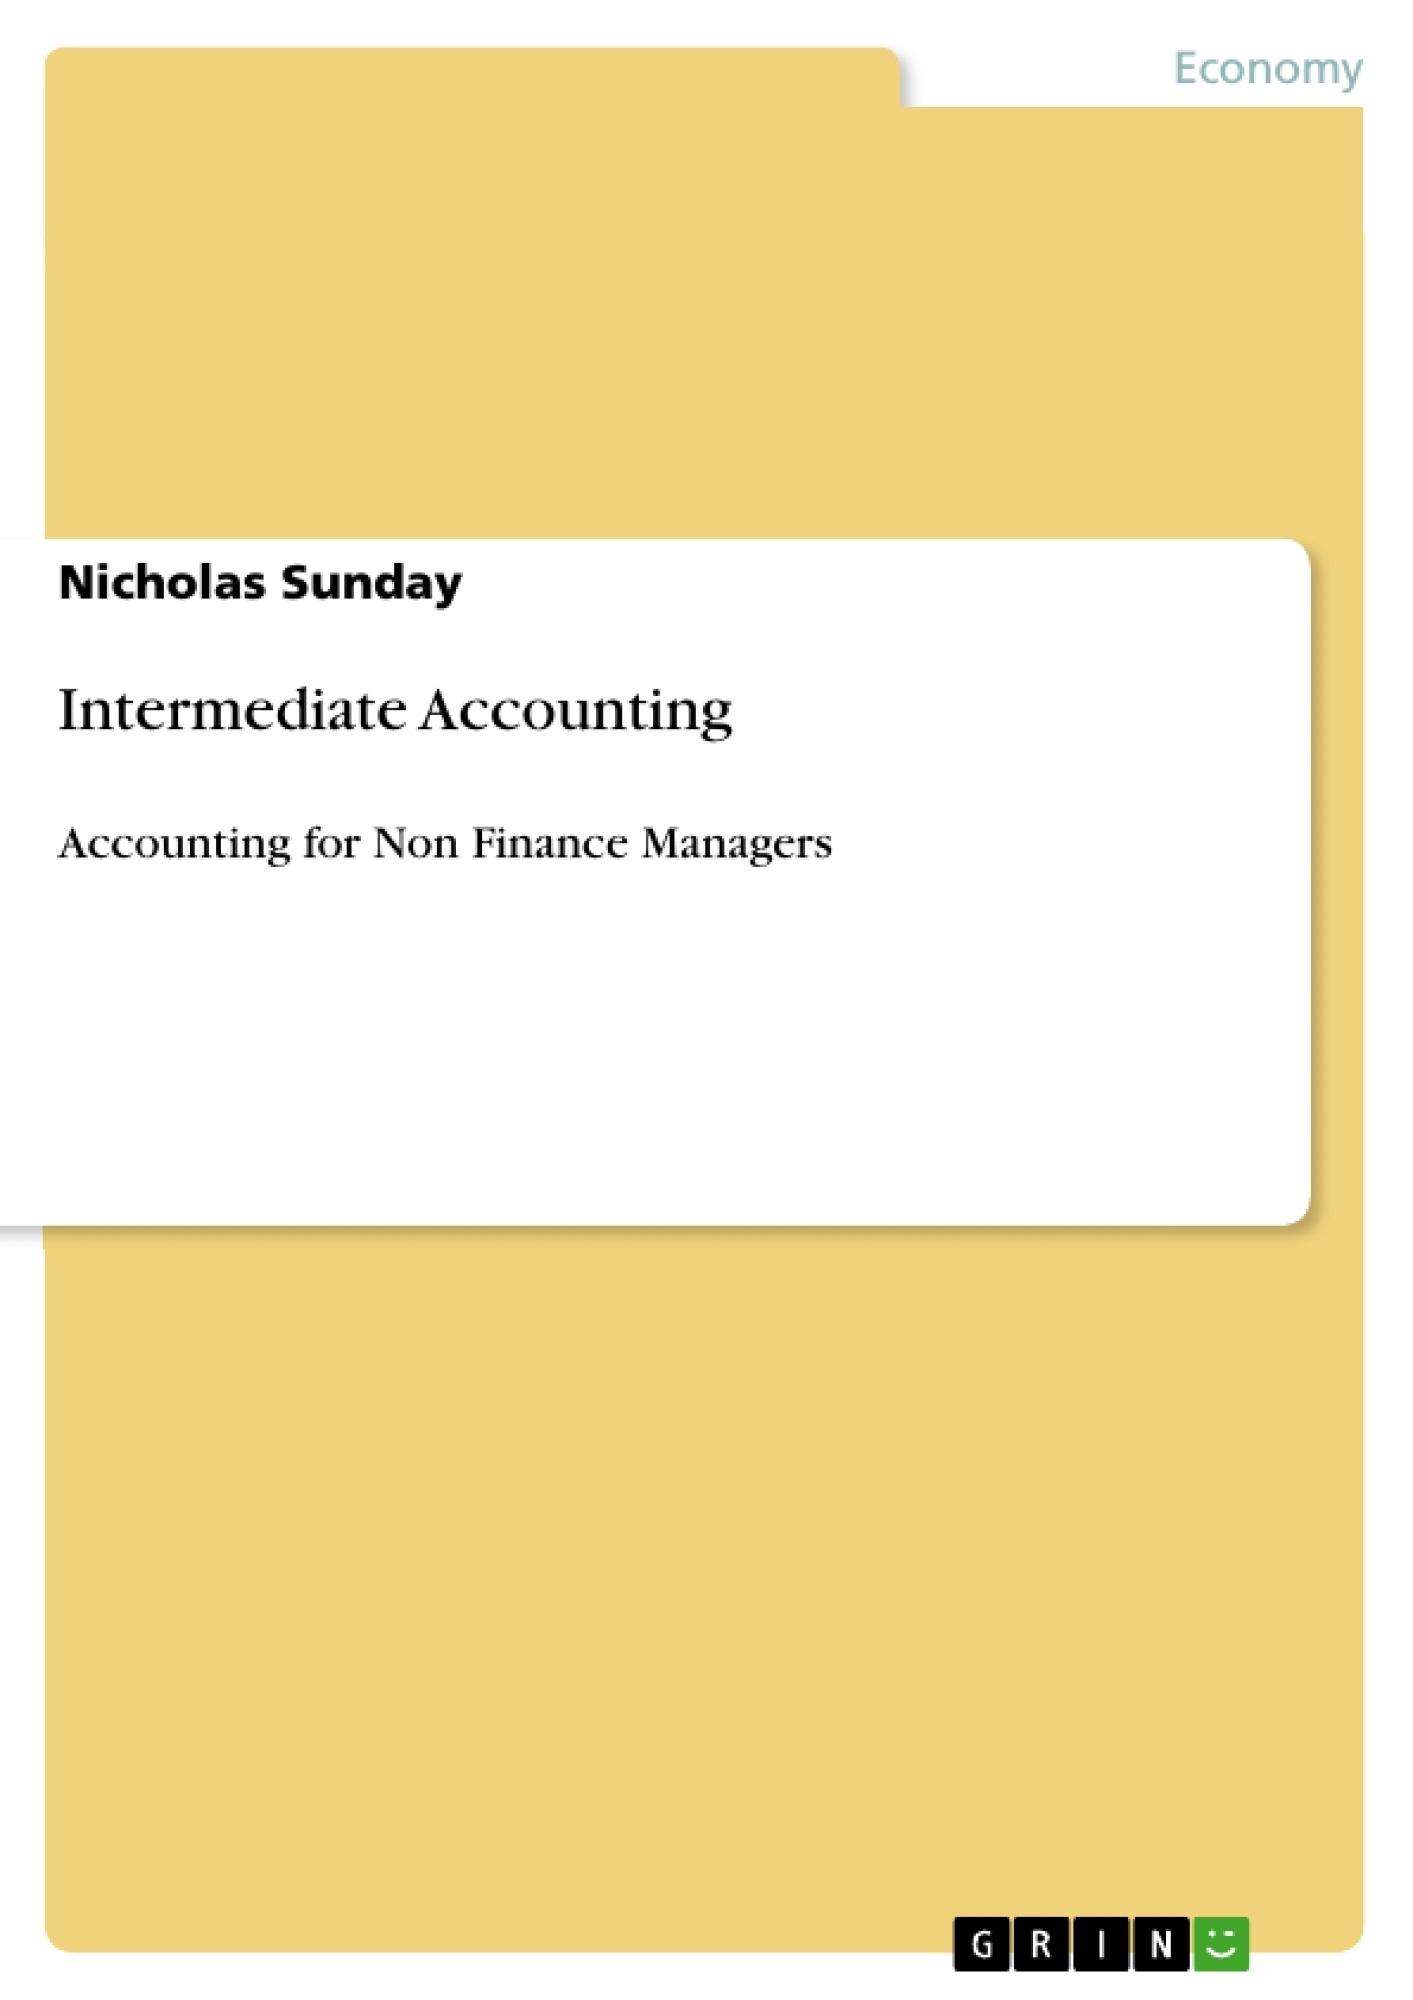 Title: Intermediate Accounting